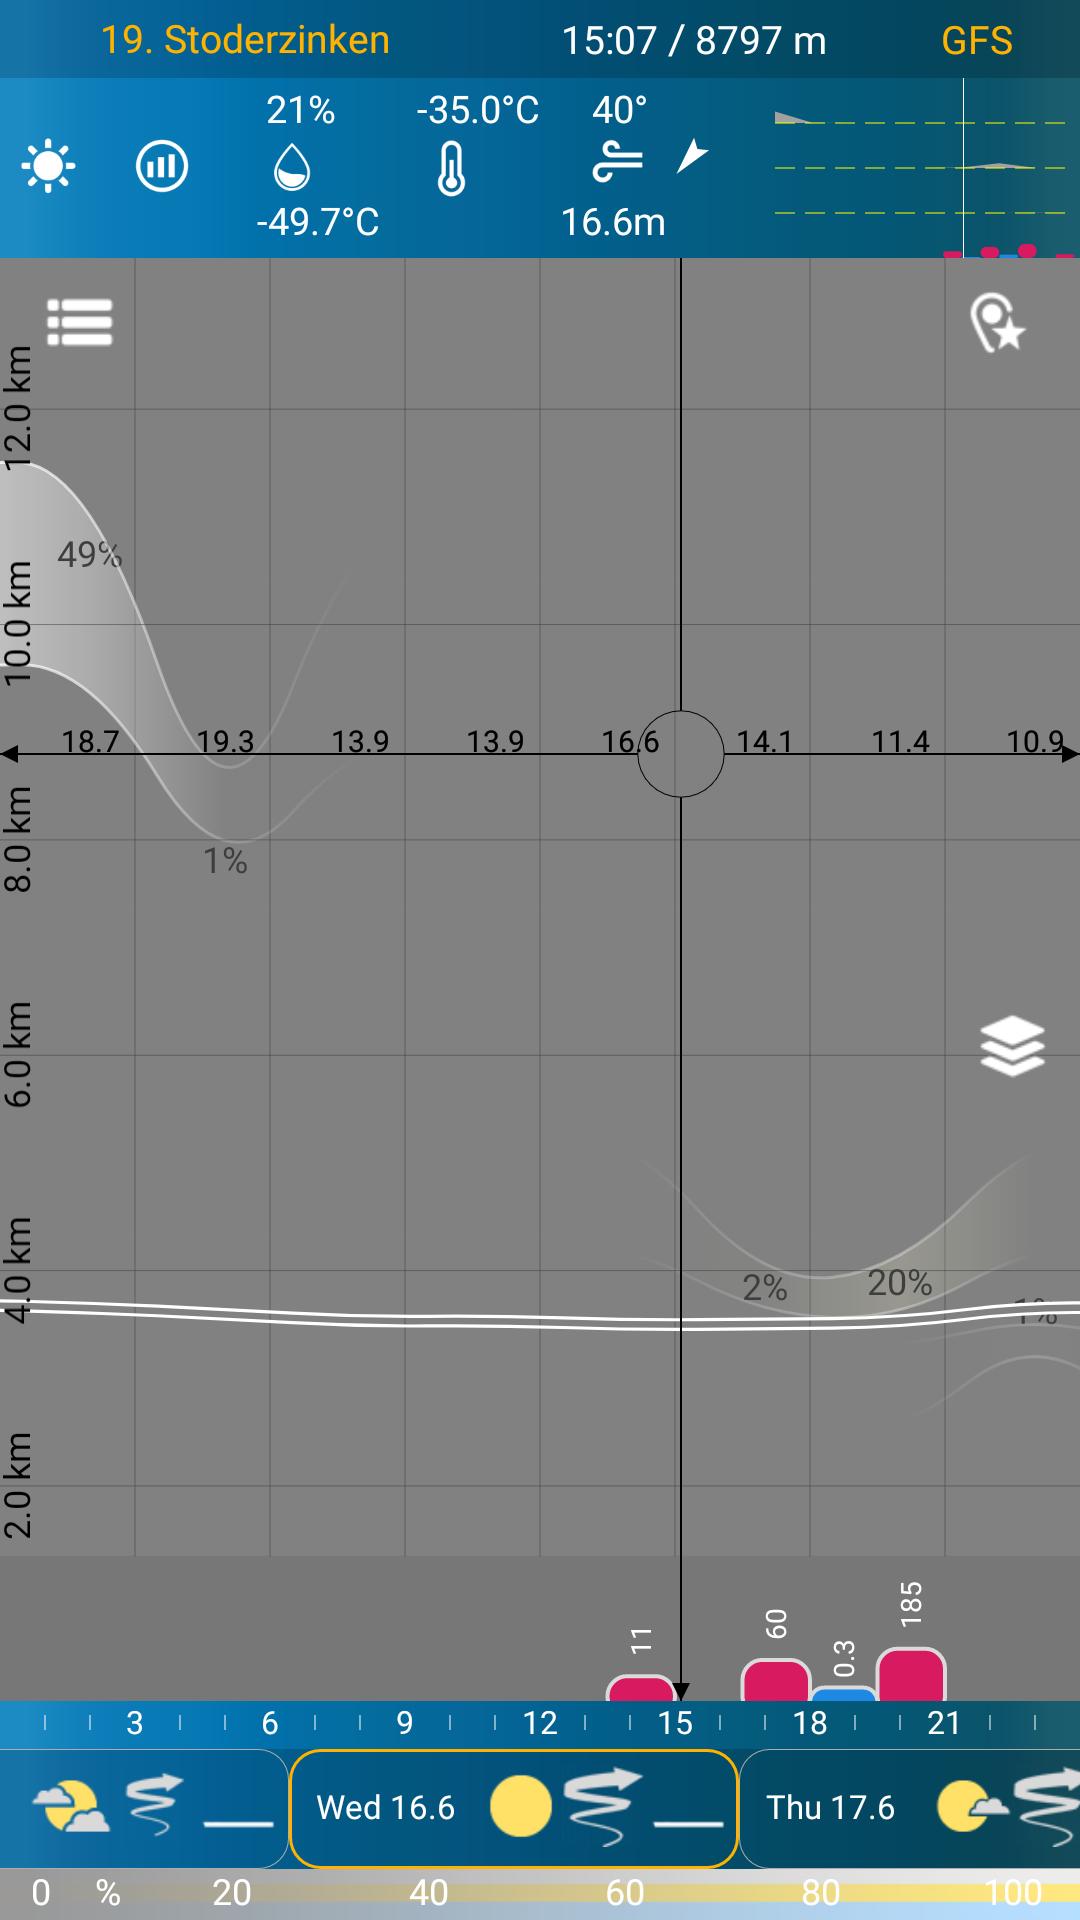 Cape, precipitation and cloud cover is minimal